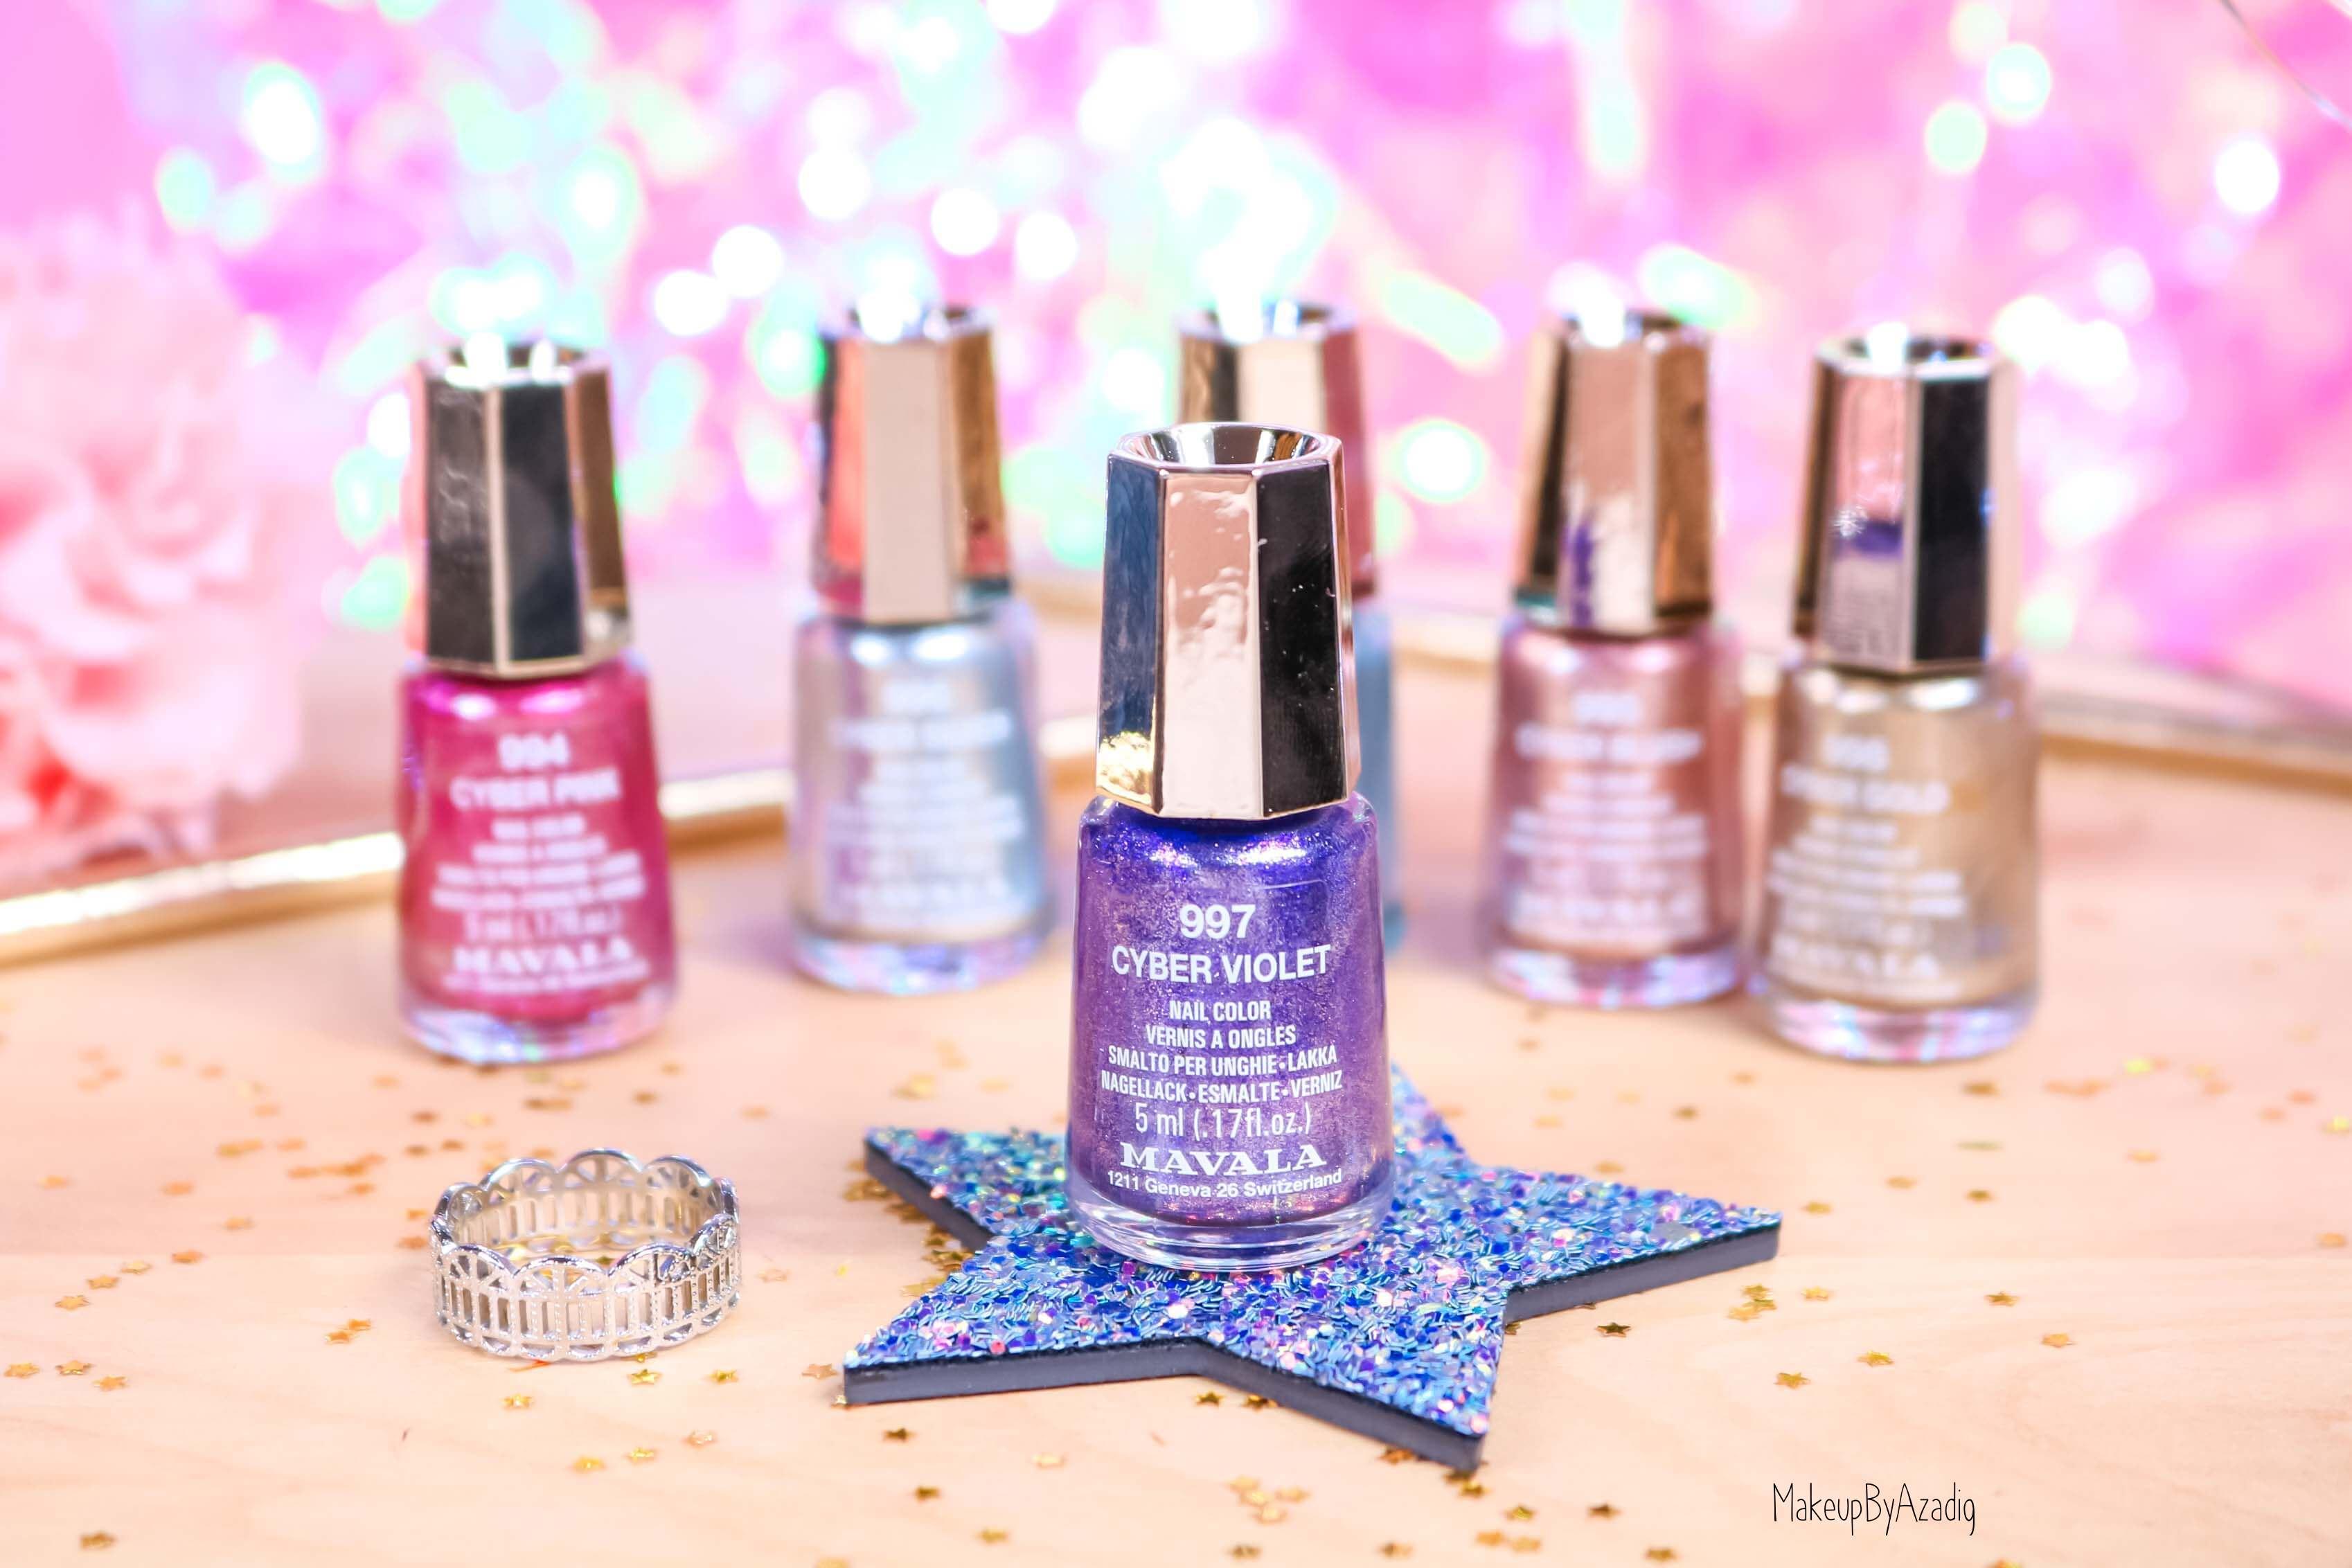 revue-collection-vernis-nails-cyber-chic-fetes-noel-metallique-gold-silver-makeupbyazadig-swatch-avis-prix-violet